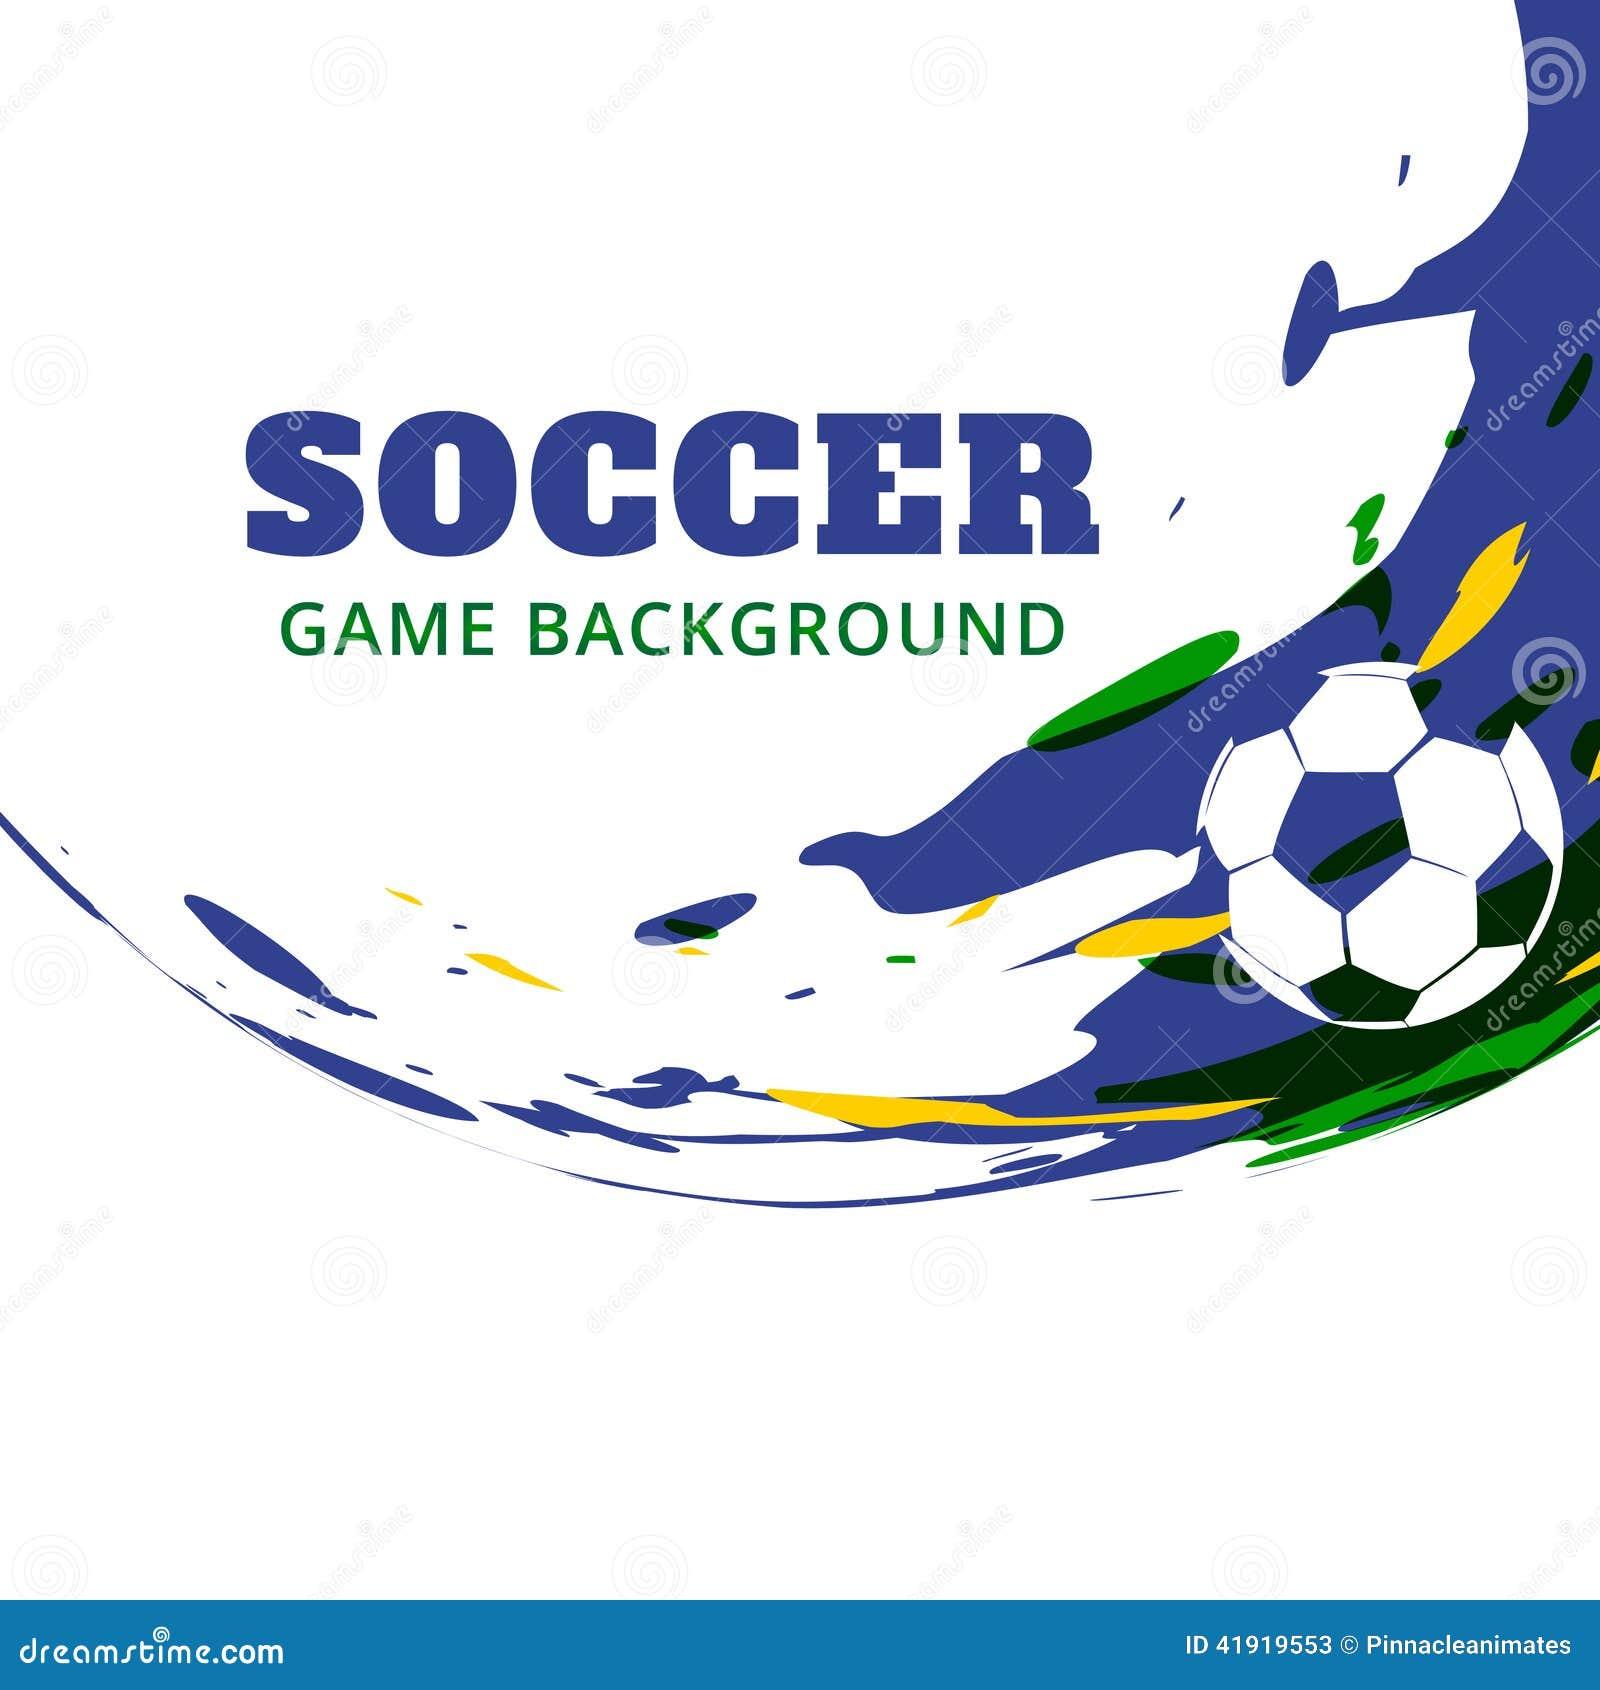 sports background designs - photo #22